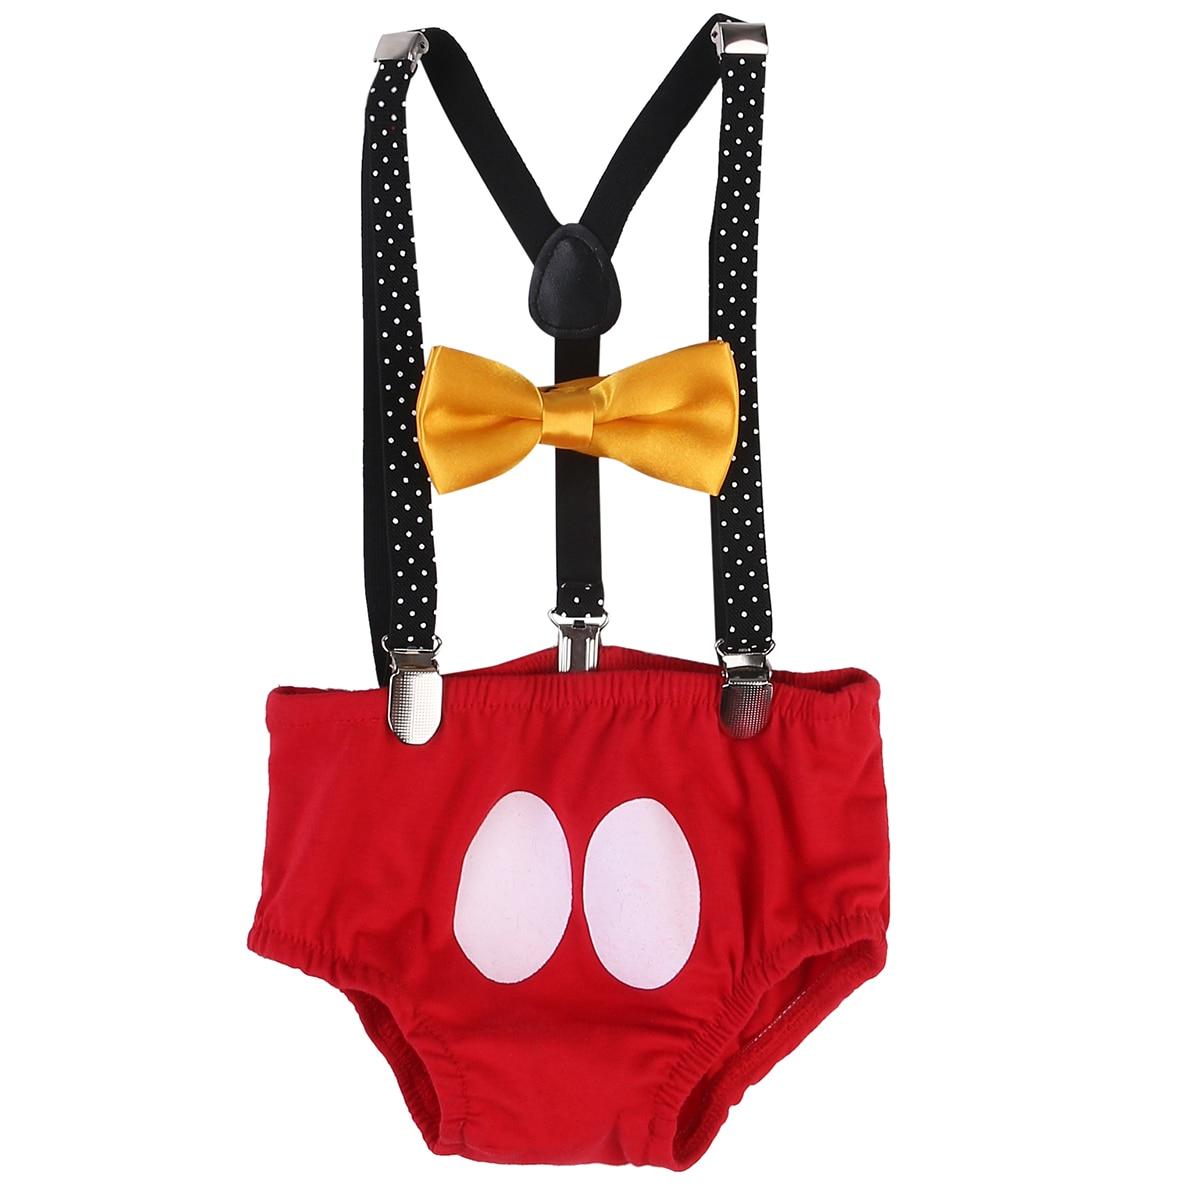 Newborn Baby Boy Girl Outfits Kids Romper Jumpsuit Pants Costume Birthday Gifts vuo82 16no7 new original rectifier bridge module